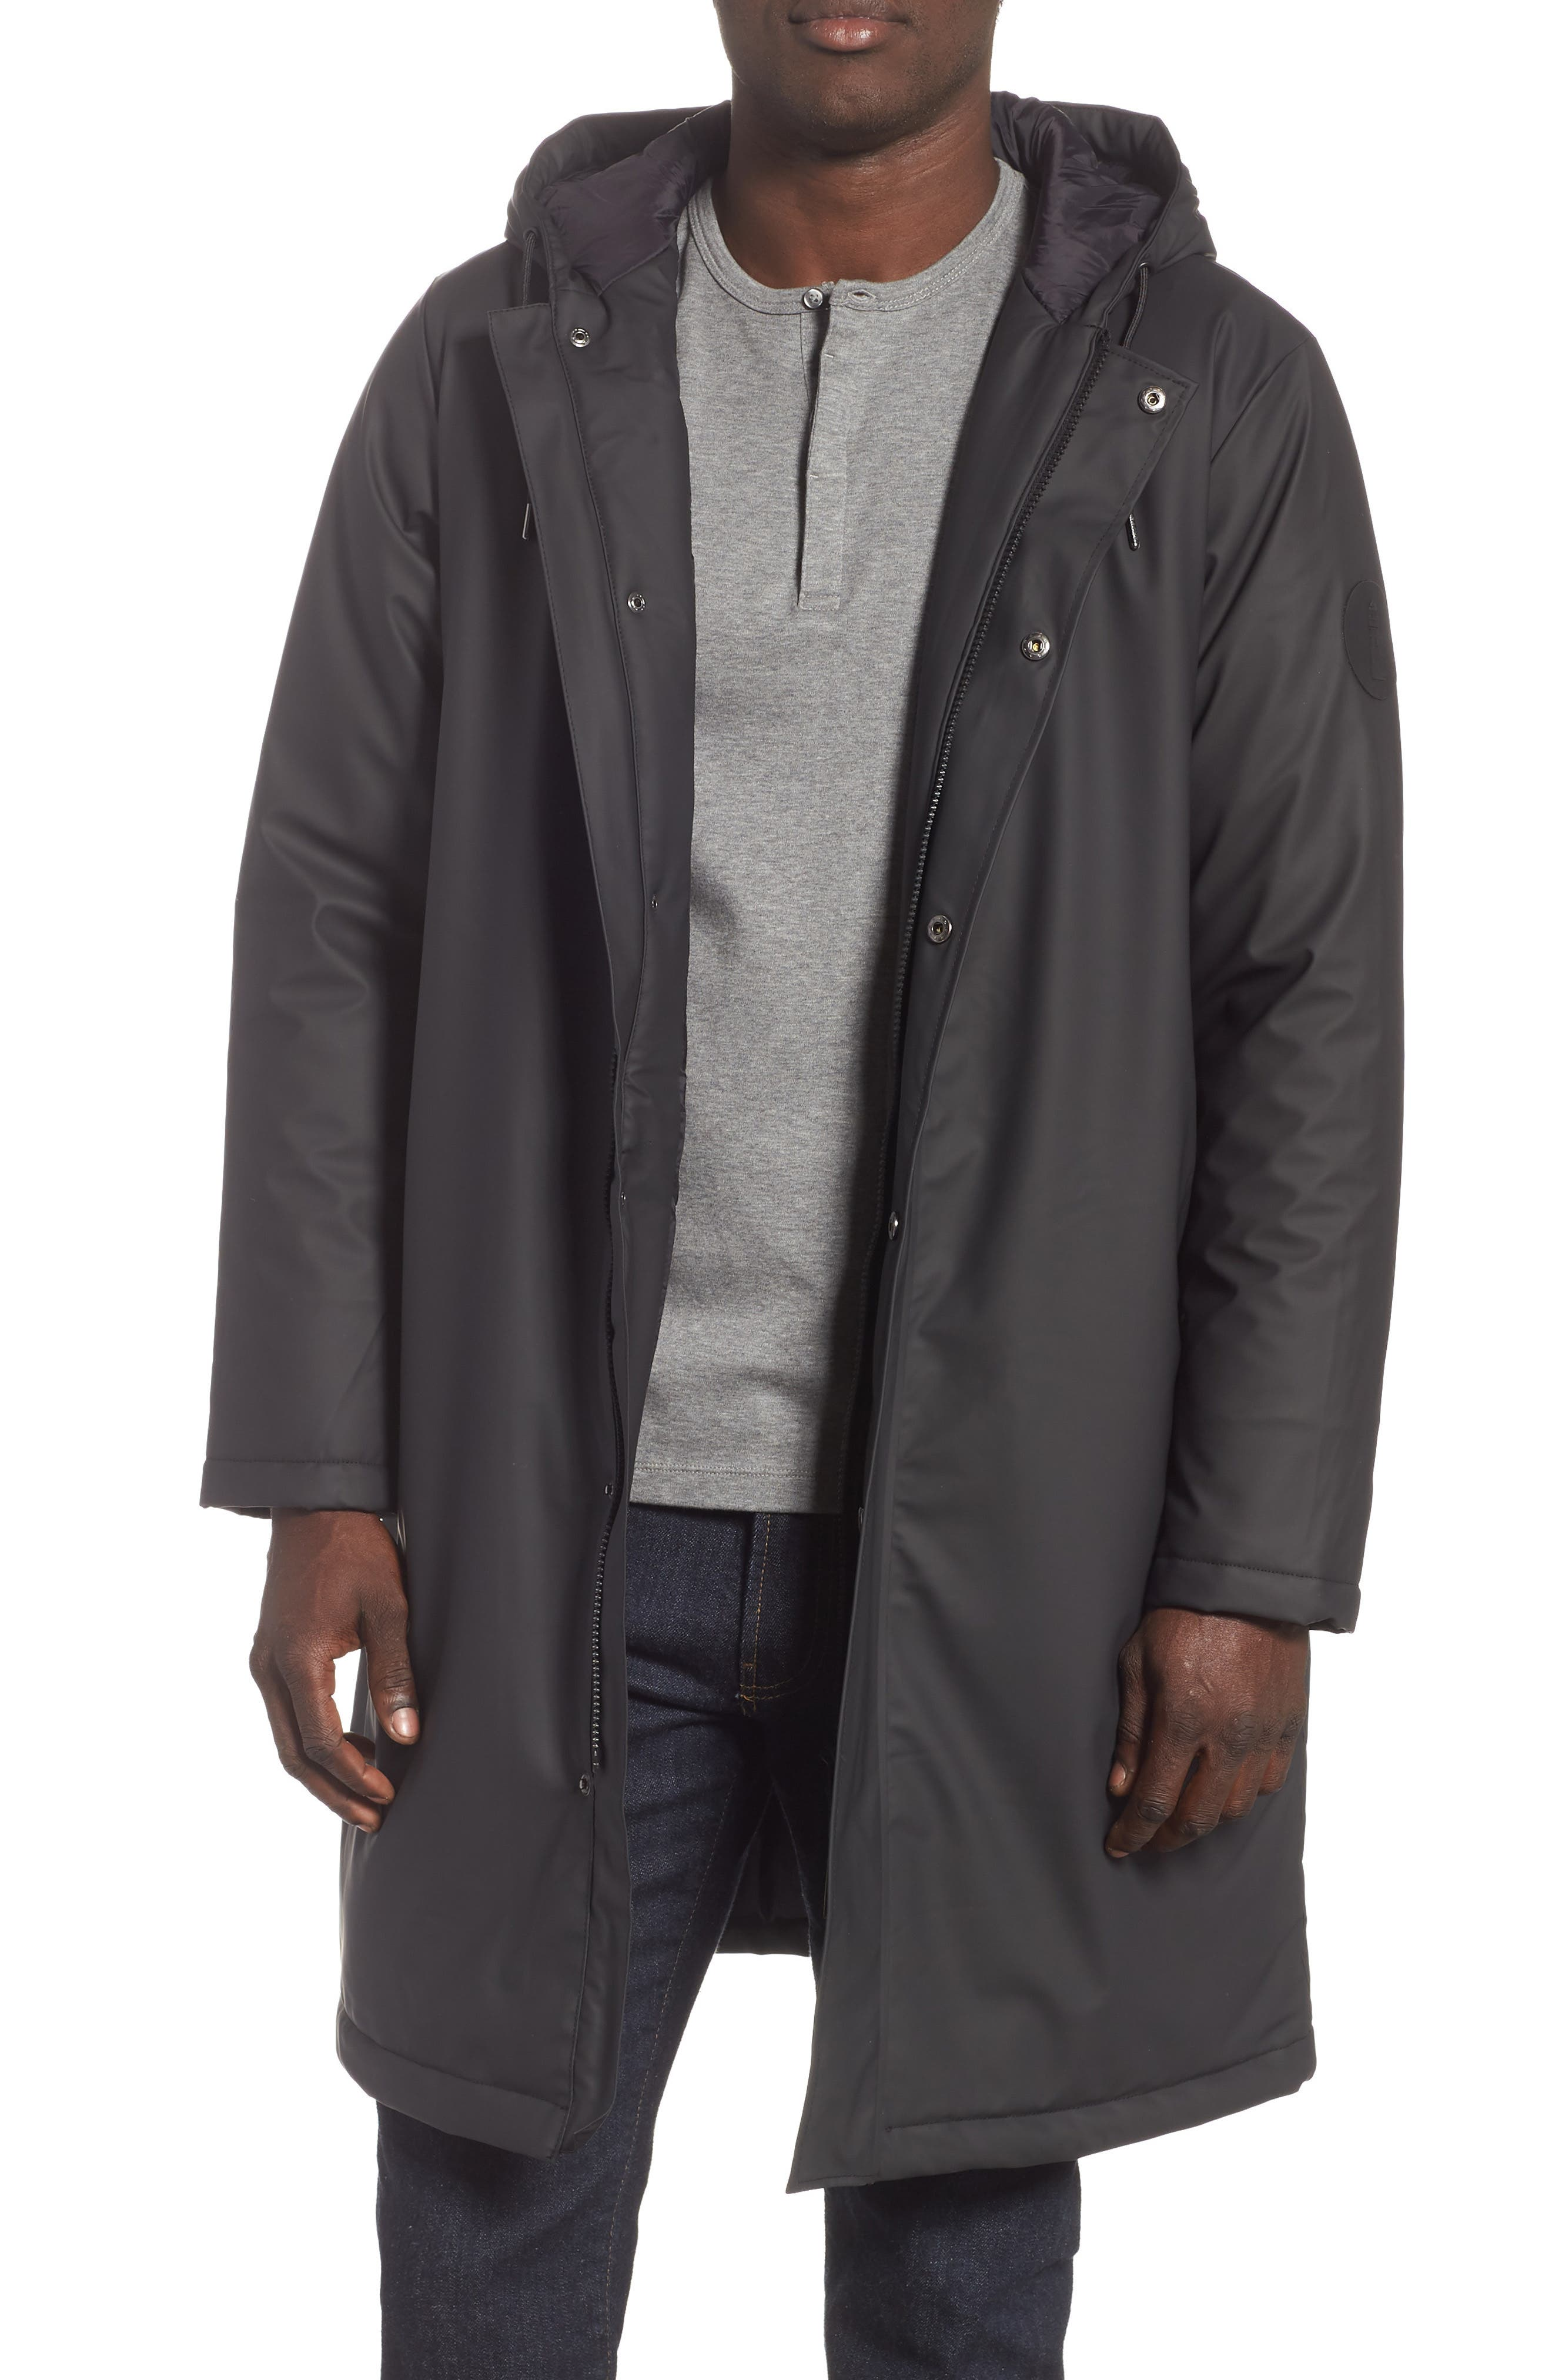 Thermal Hooded Raincoat,                             Main thumbnail 1, color,                             BLACK